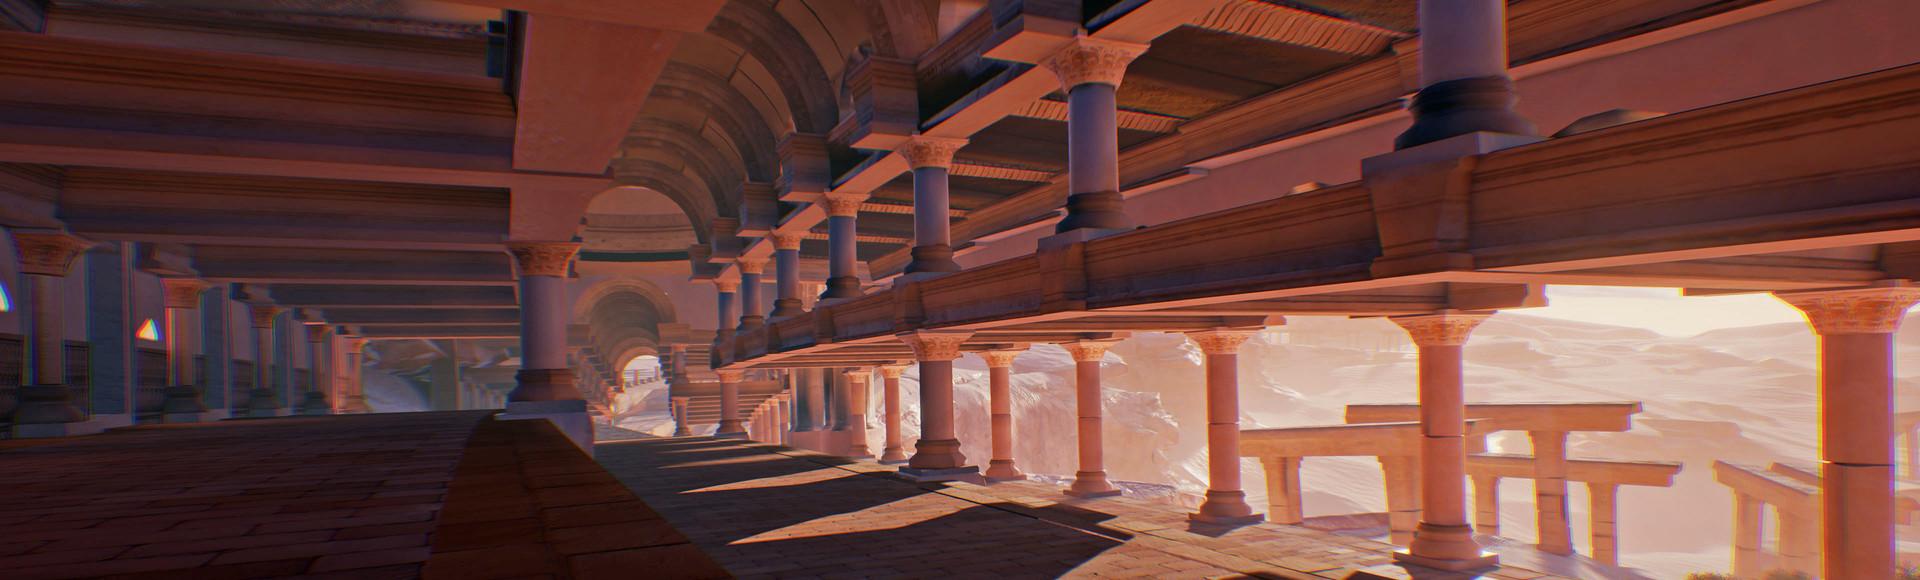 Florian thomasset desert temple 5